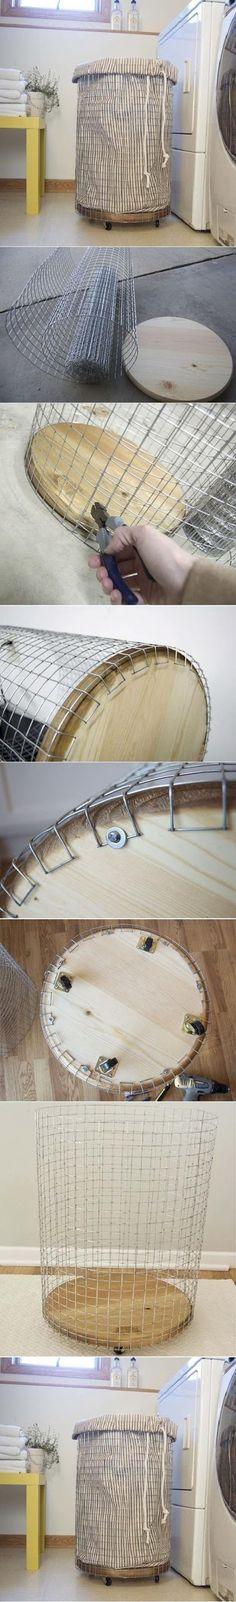 DIY : How To Make a Laundry Basket idea, craft, hamper, diy laundri, chicken wire, diy project, wire baskets, laundry baskets, laundri basket